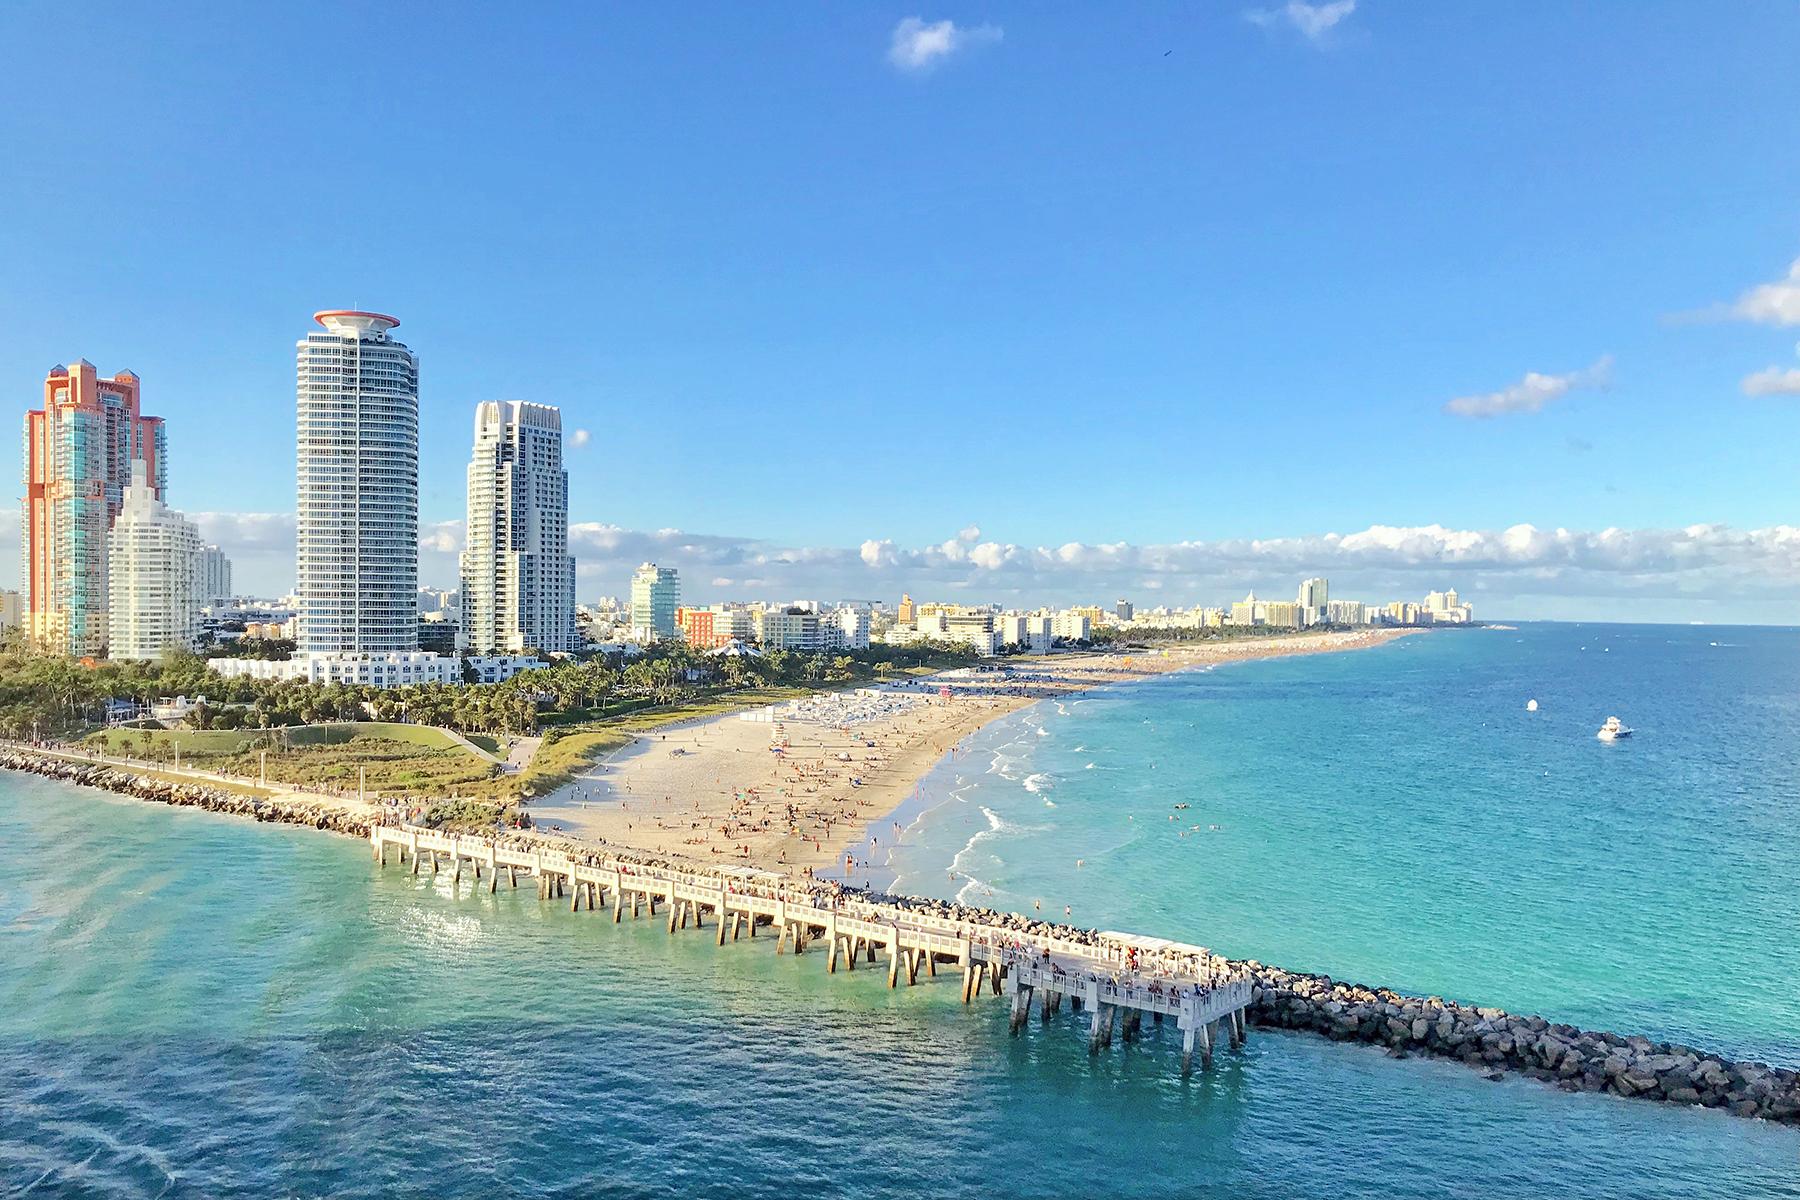 Dexter-Drehorte: 9 Locations in Miami, wo man Dexter Morgan begegnen kann